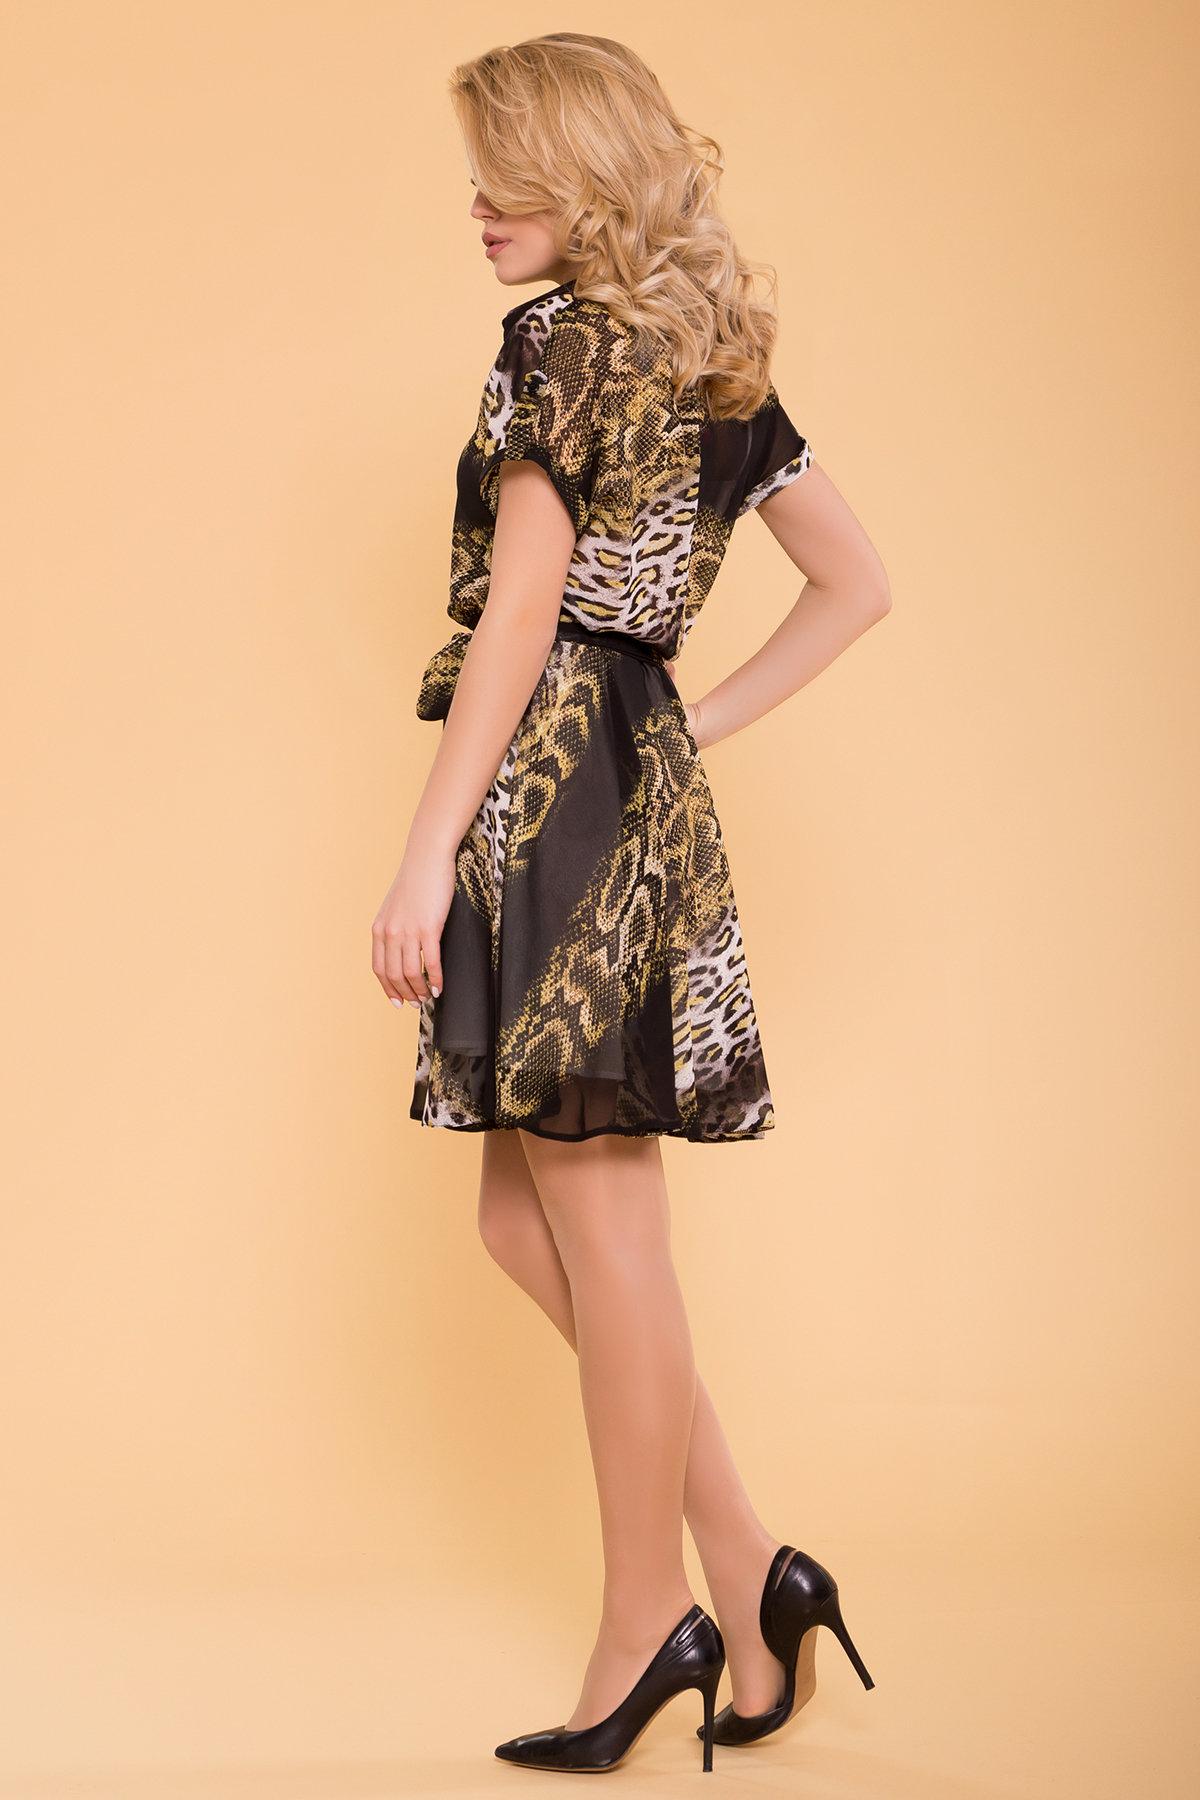 Платье Санжар 6935 АРТ. 42078 Цвет: Леоп абстр беж/чер - фото 2, интернет магазин tm-modus.ru